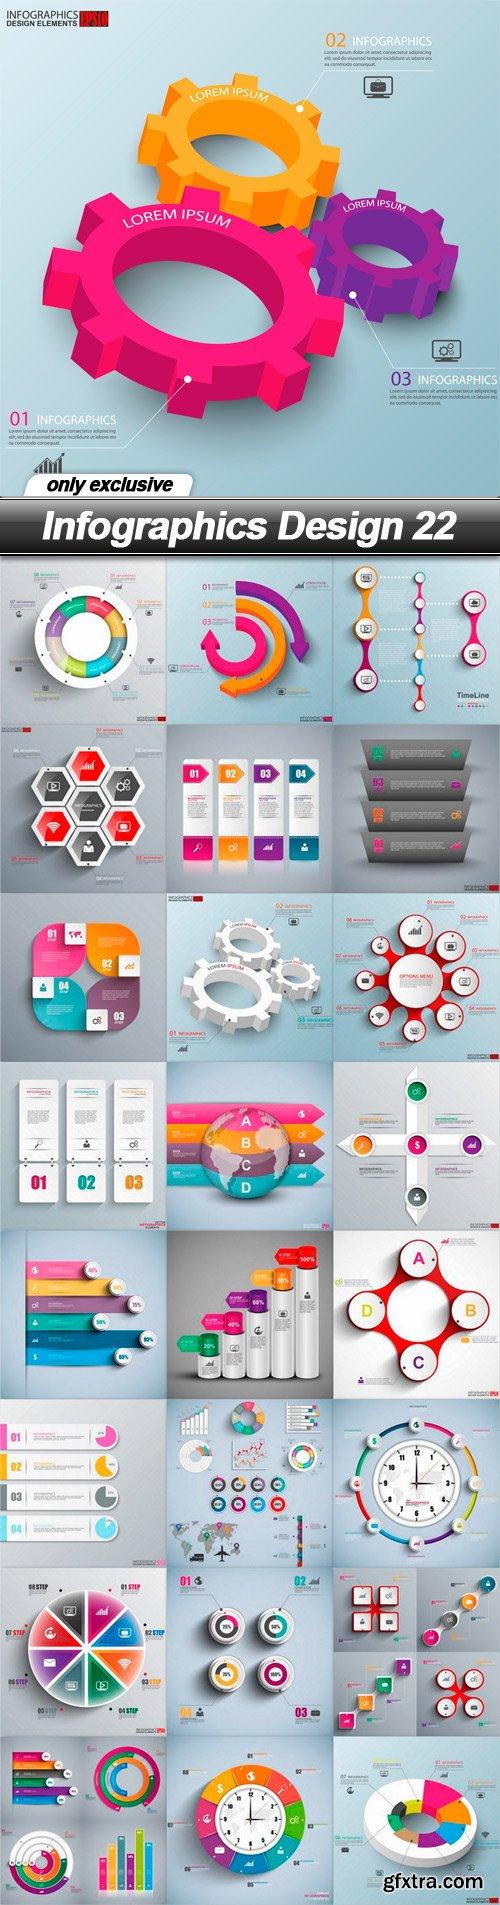 Infographics Design 22 - 25 EPS